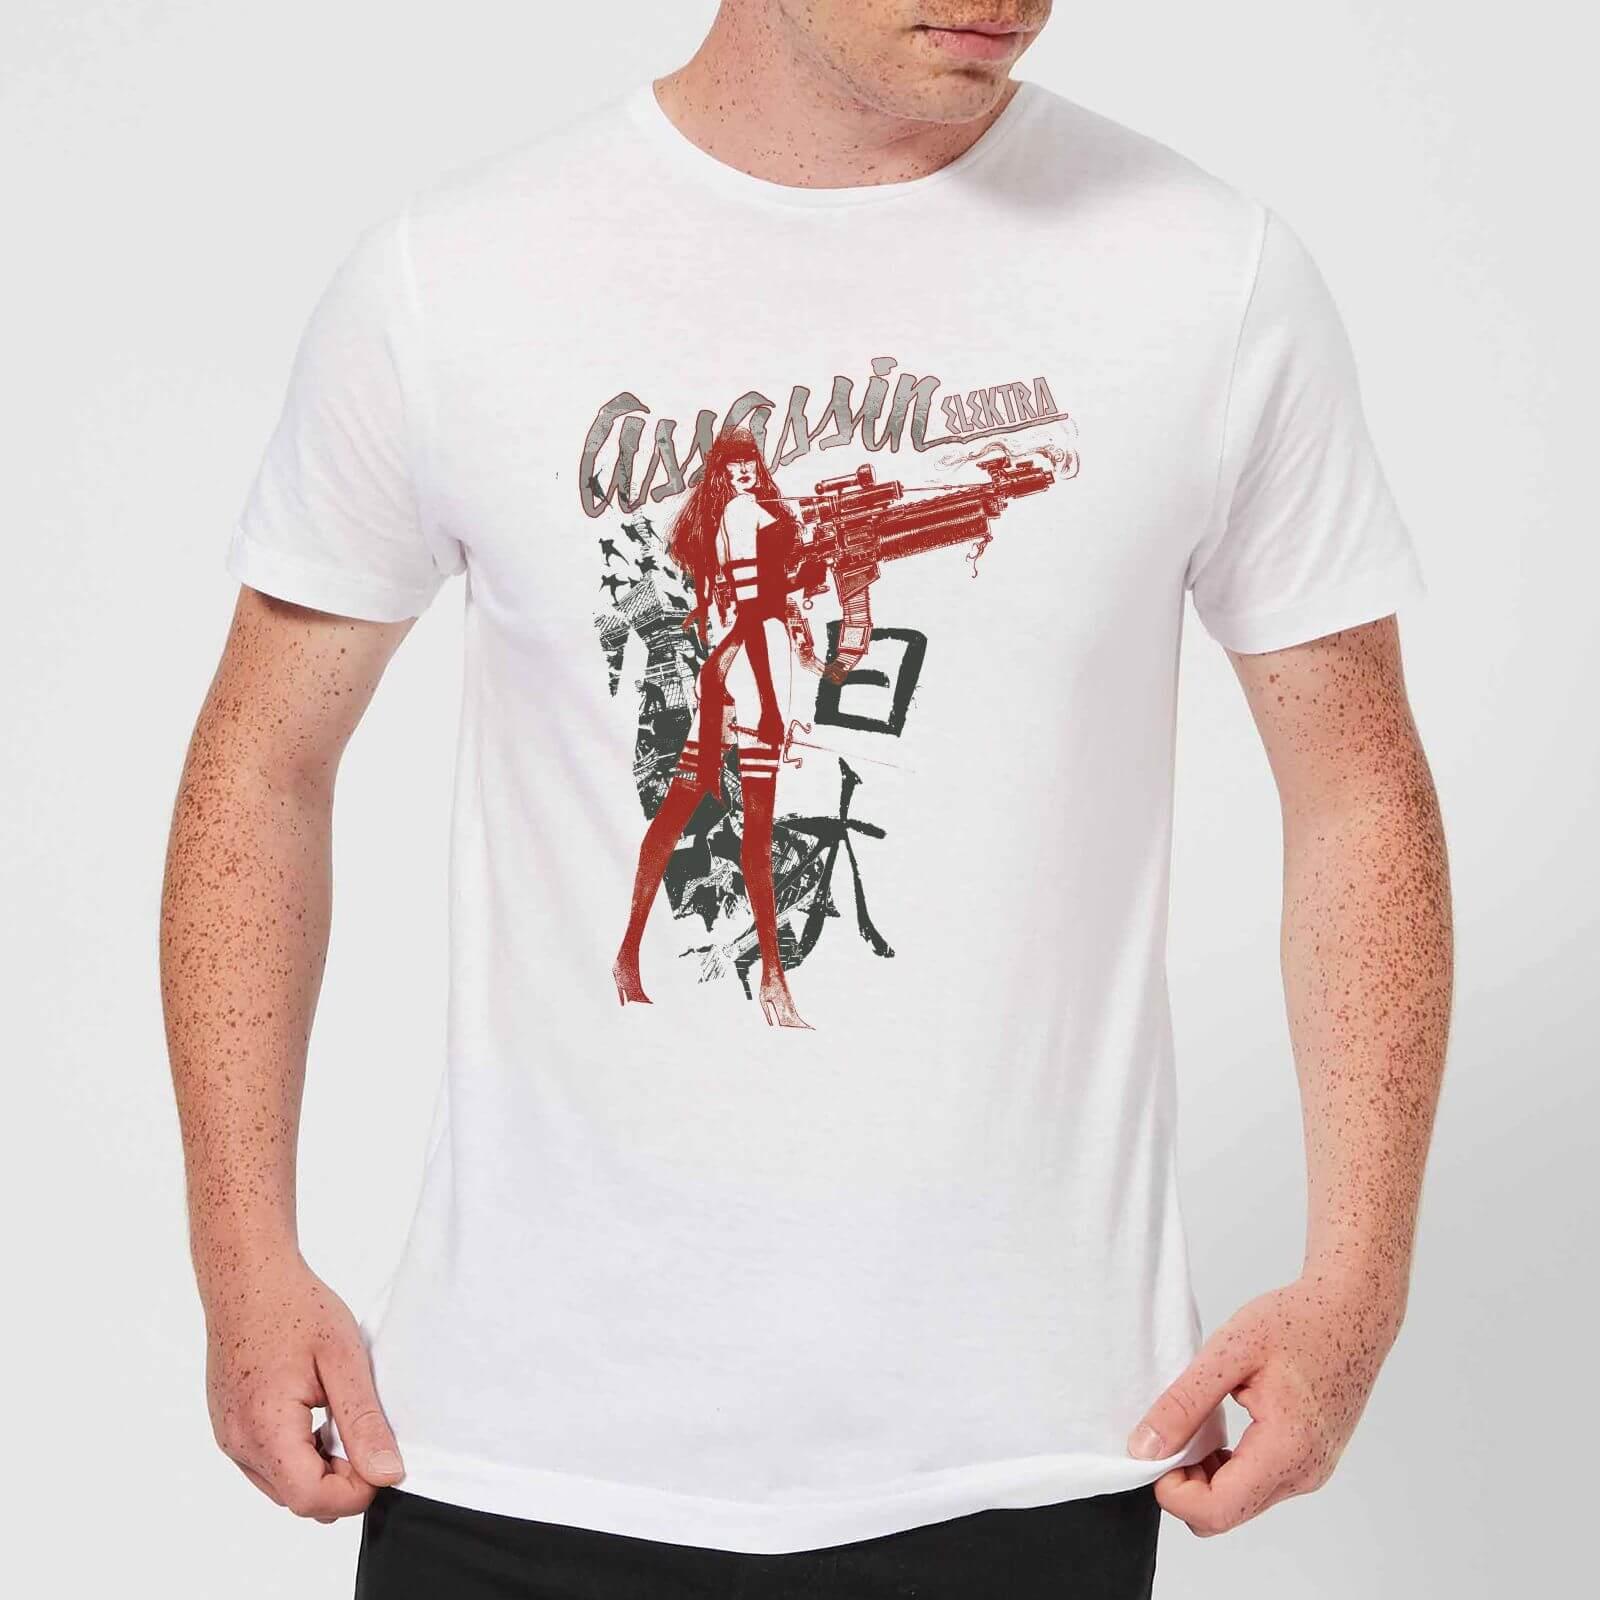 OfferteWeb.click 71-t-shirt-marvel-knights-elektra-assassin-bianco-uomo